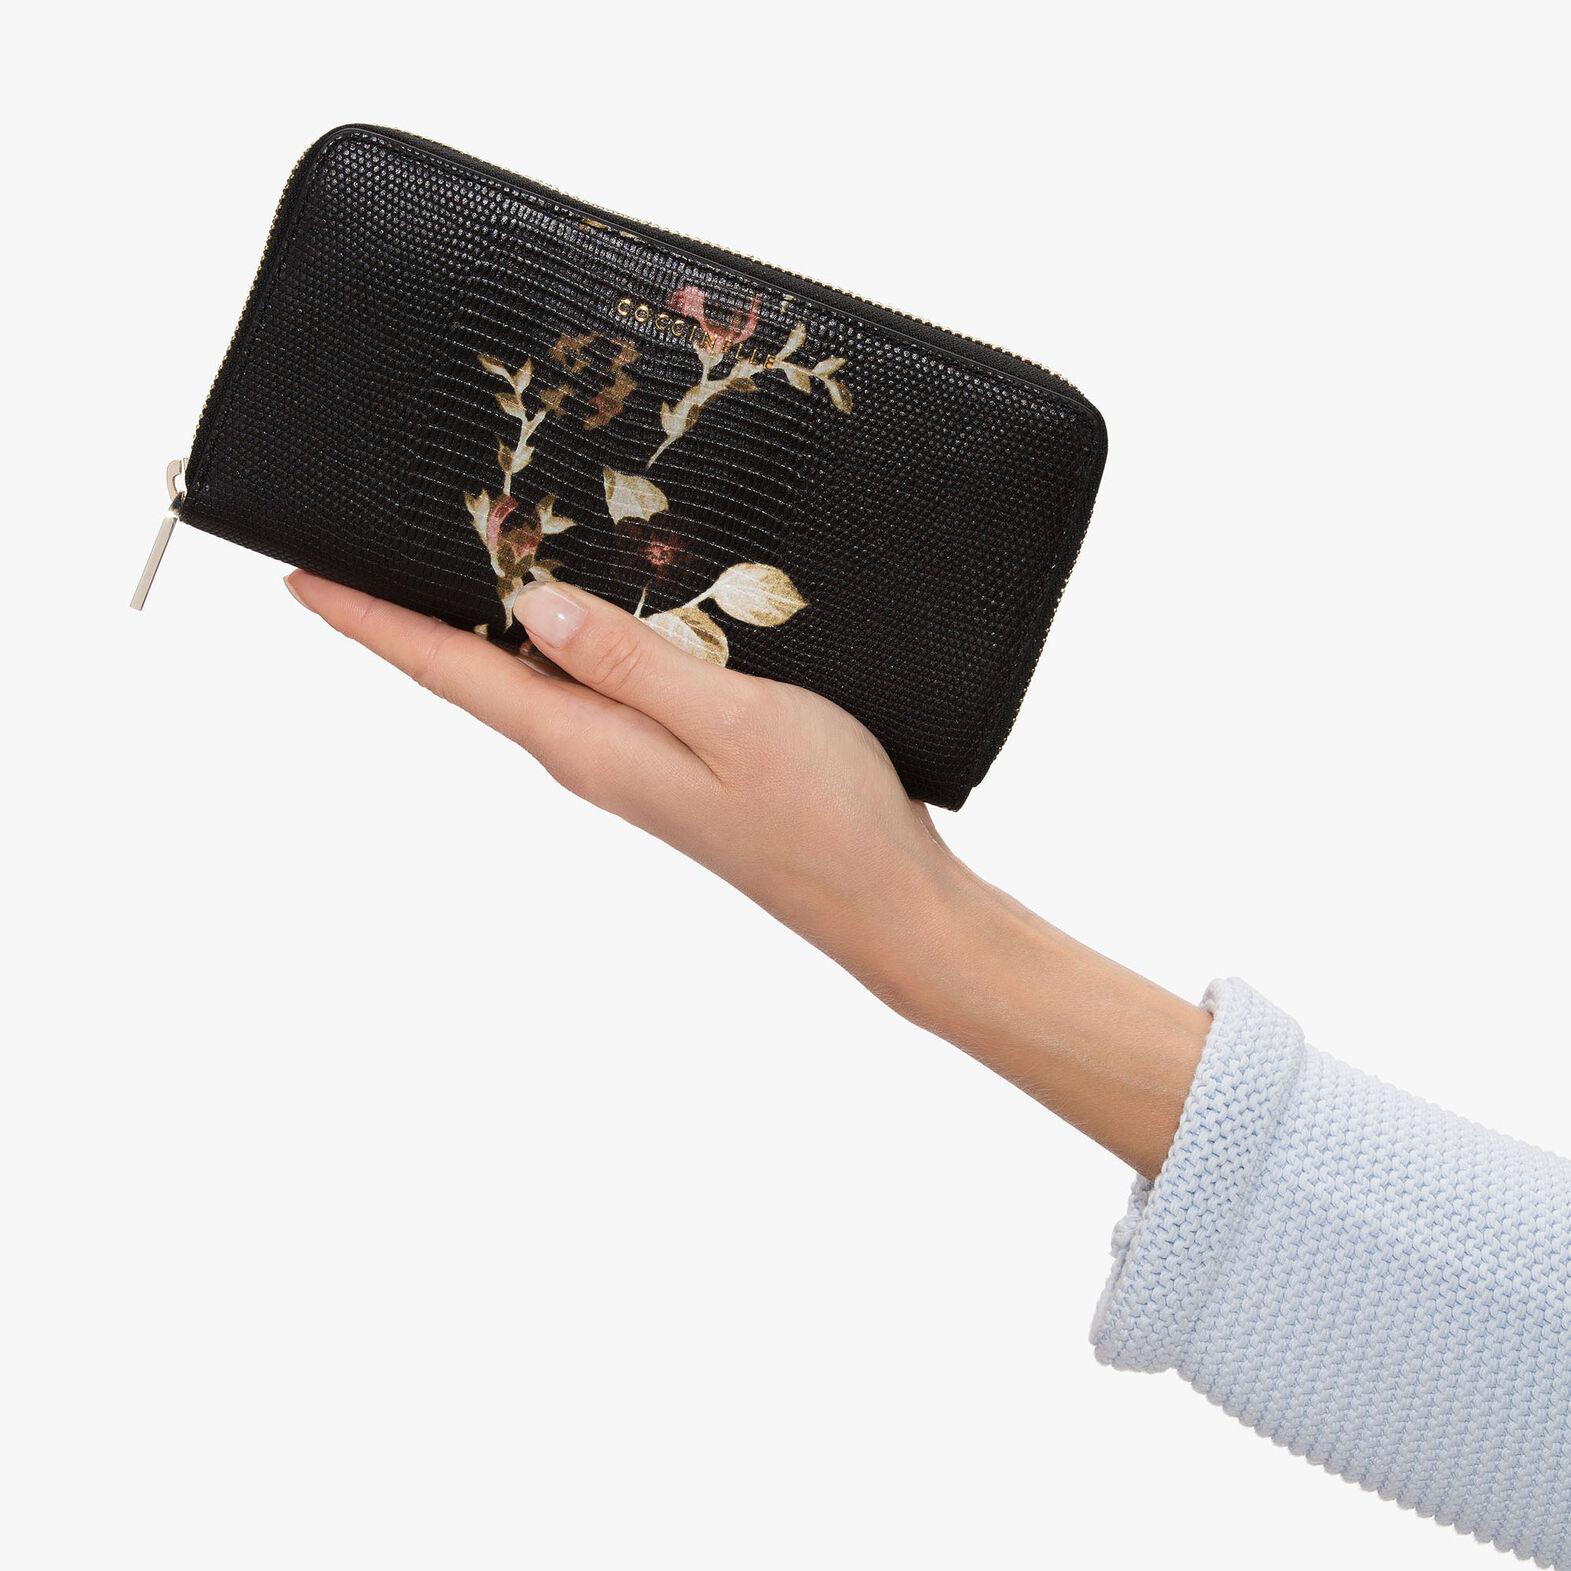 Lizard-print leather wallet